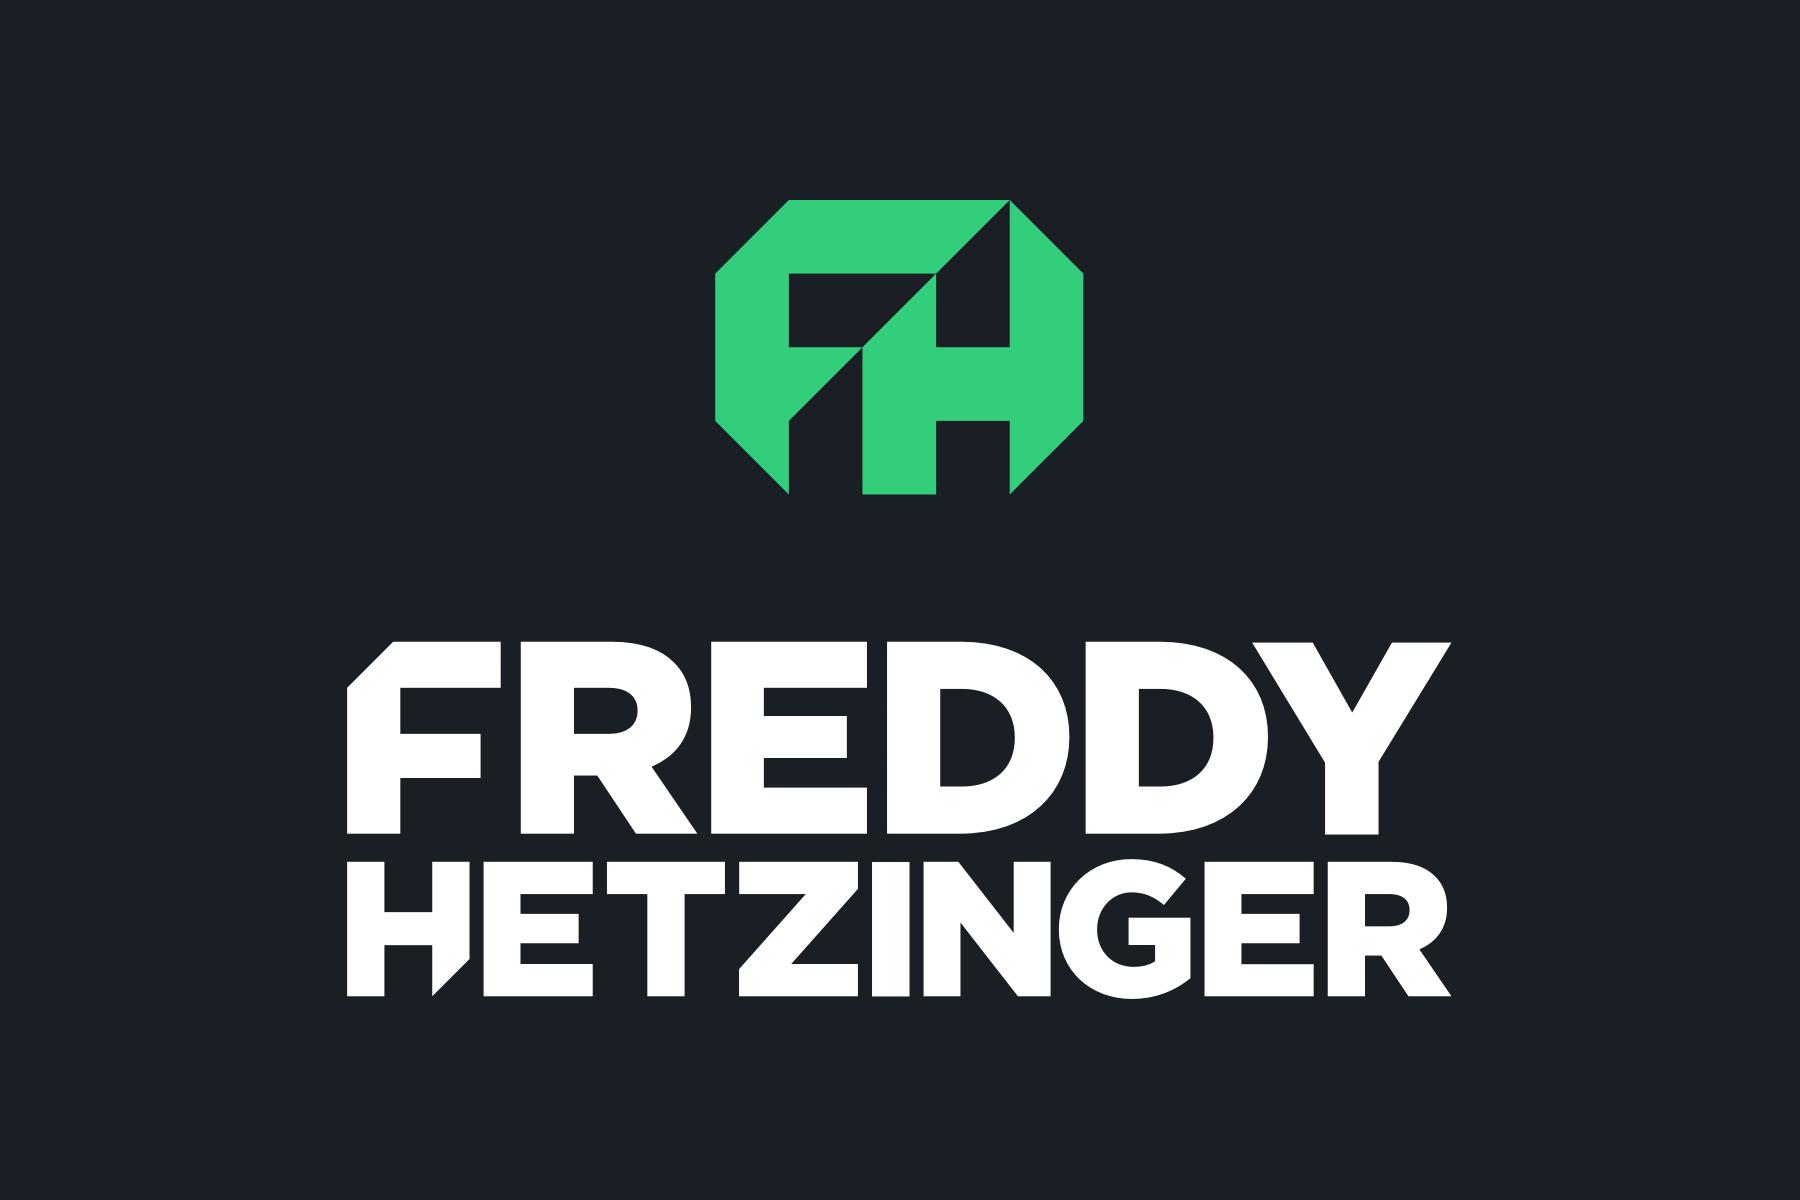 Freddy Hetzinger - Lockup